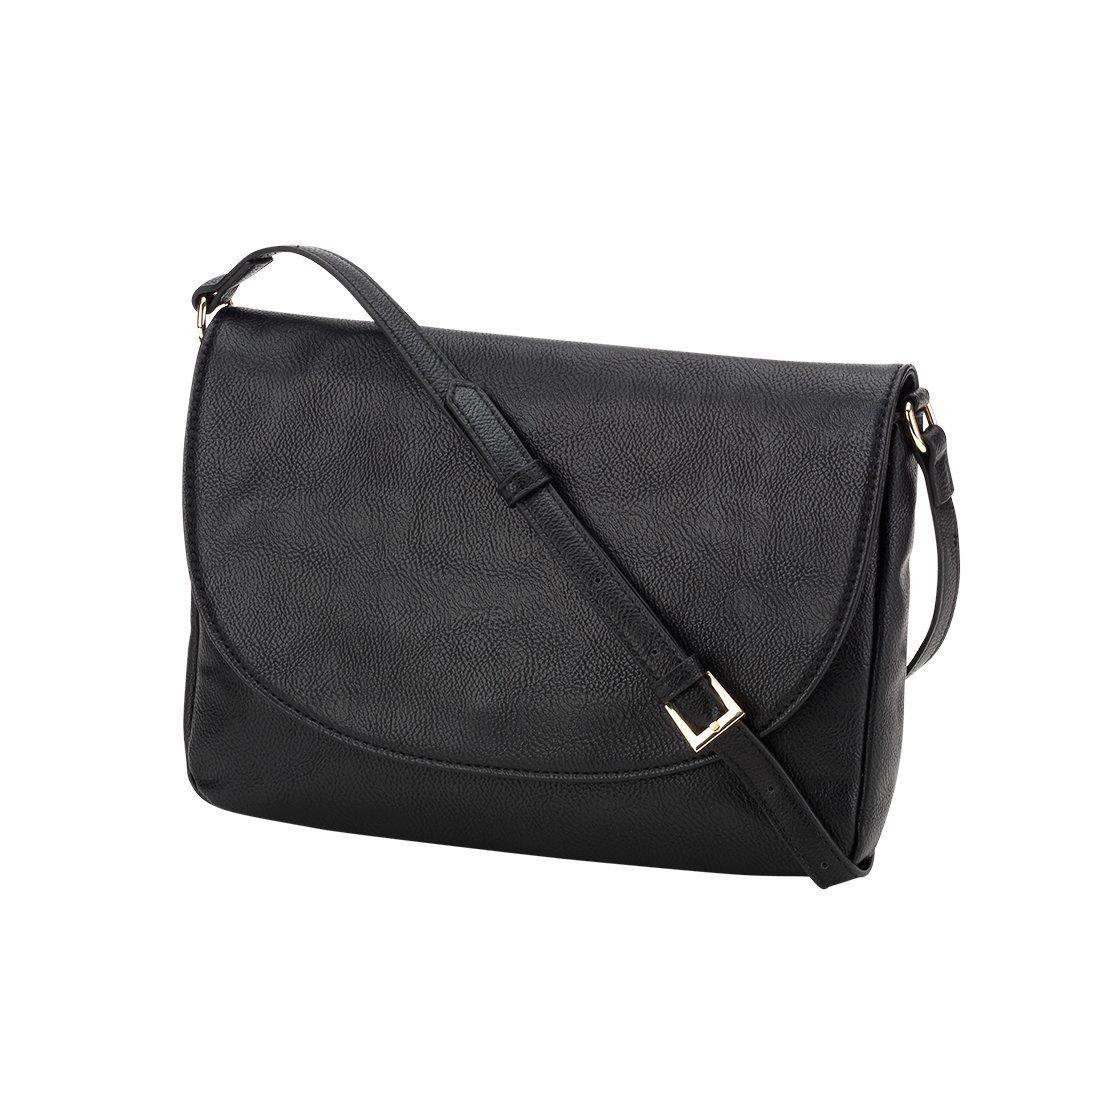 f5c679b2b1 Black Anna Crossbody Bag - Personalized, FW2018, personalized, purse, vegan  leather, women, womens accessories, Viv&Lou, Bag ...